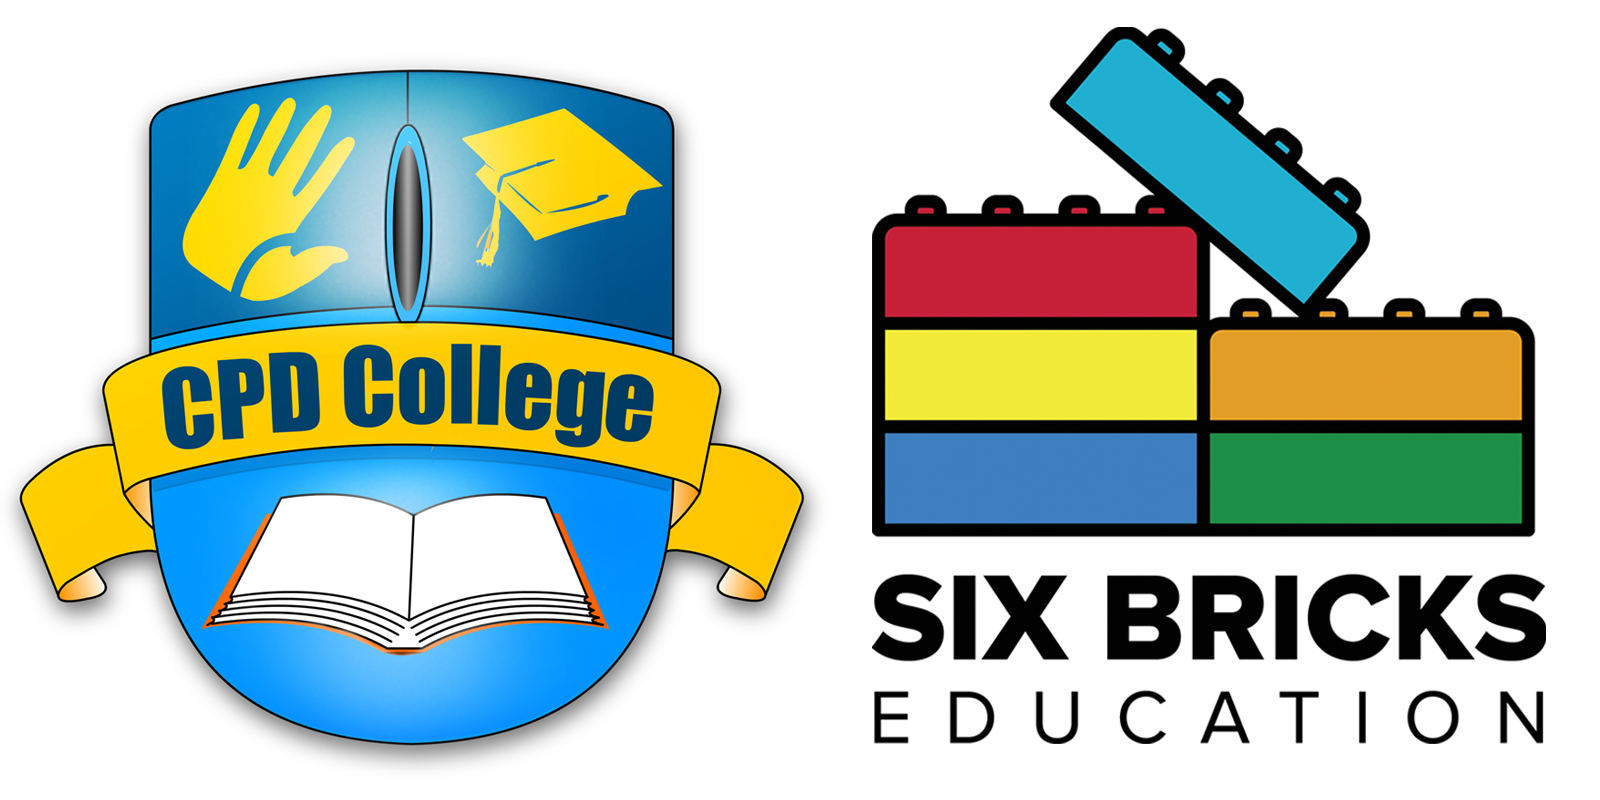 CPD College Six Bricks Education